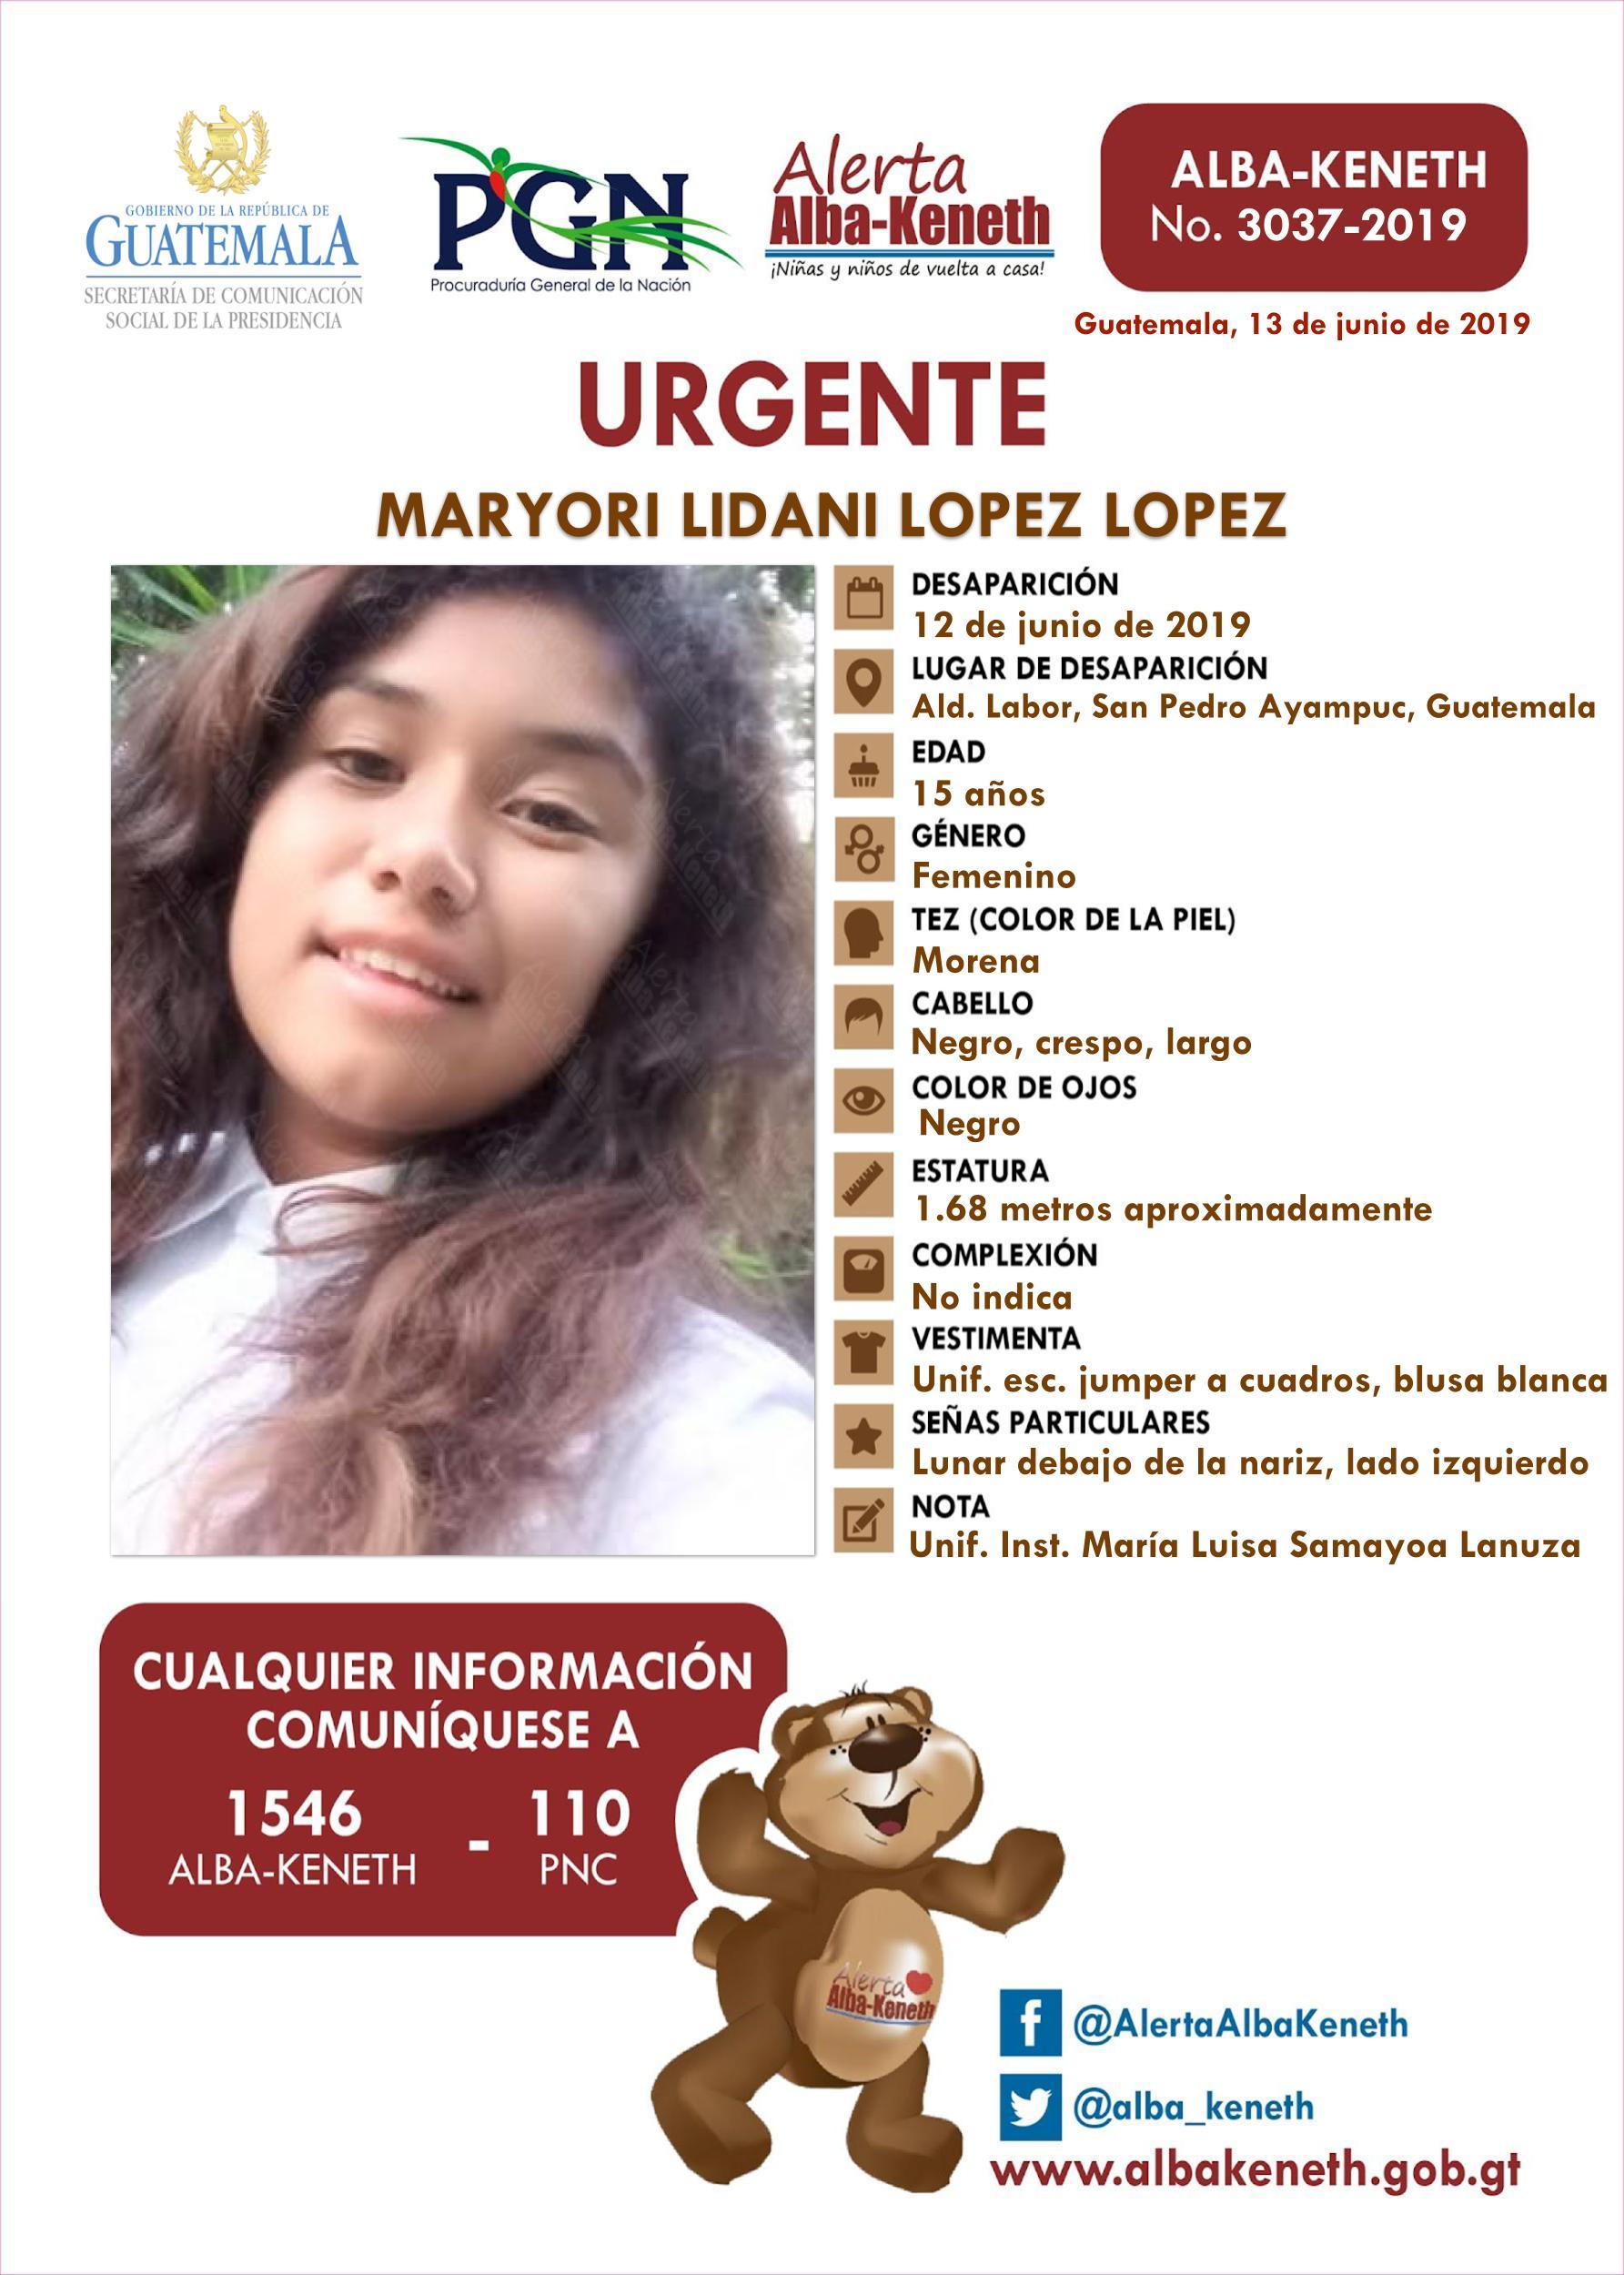 Maryori Lidani Lopez Lopez